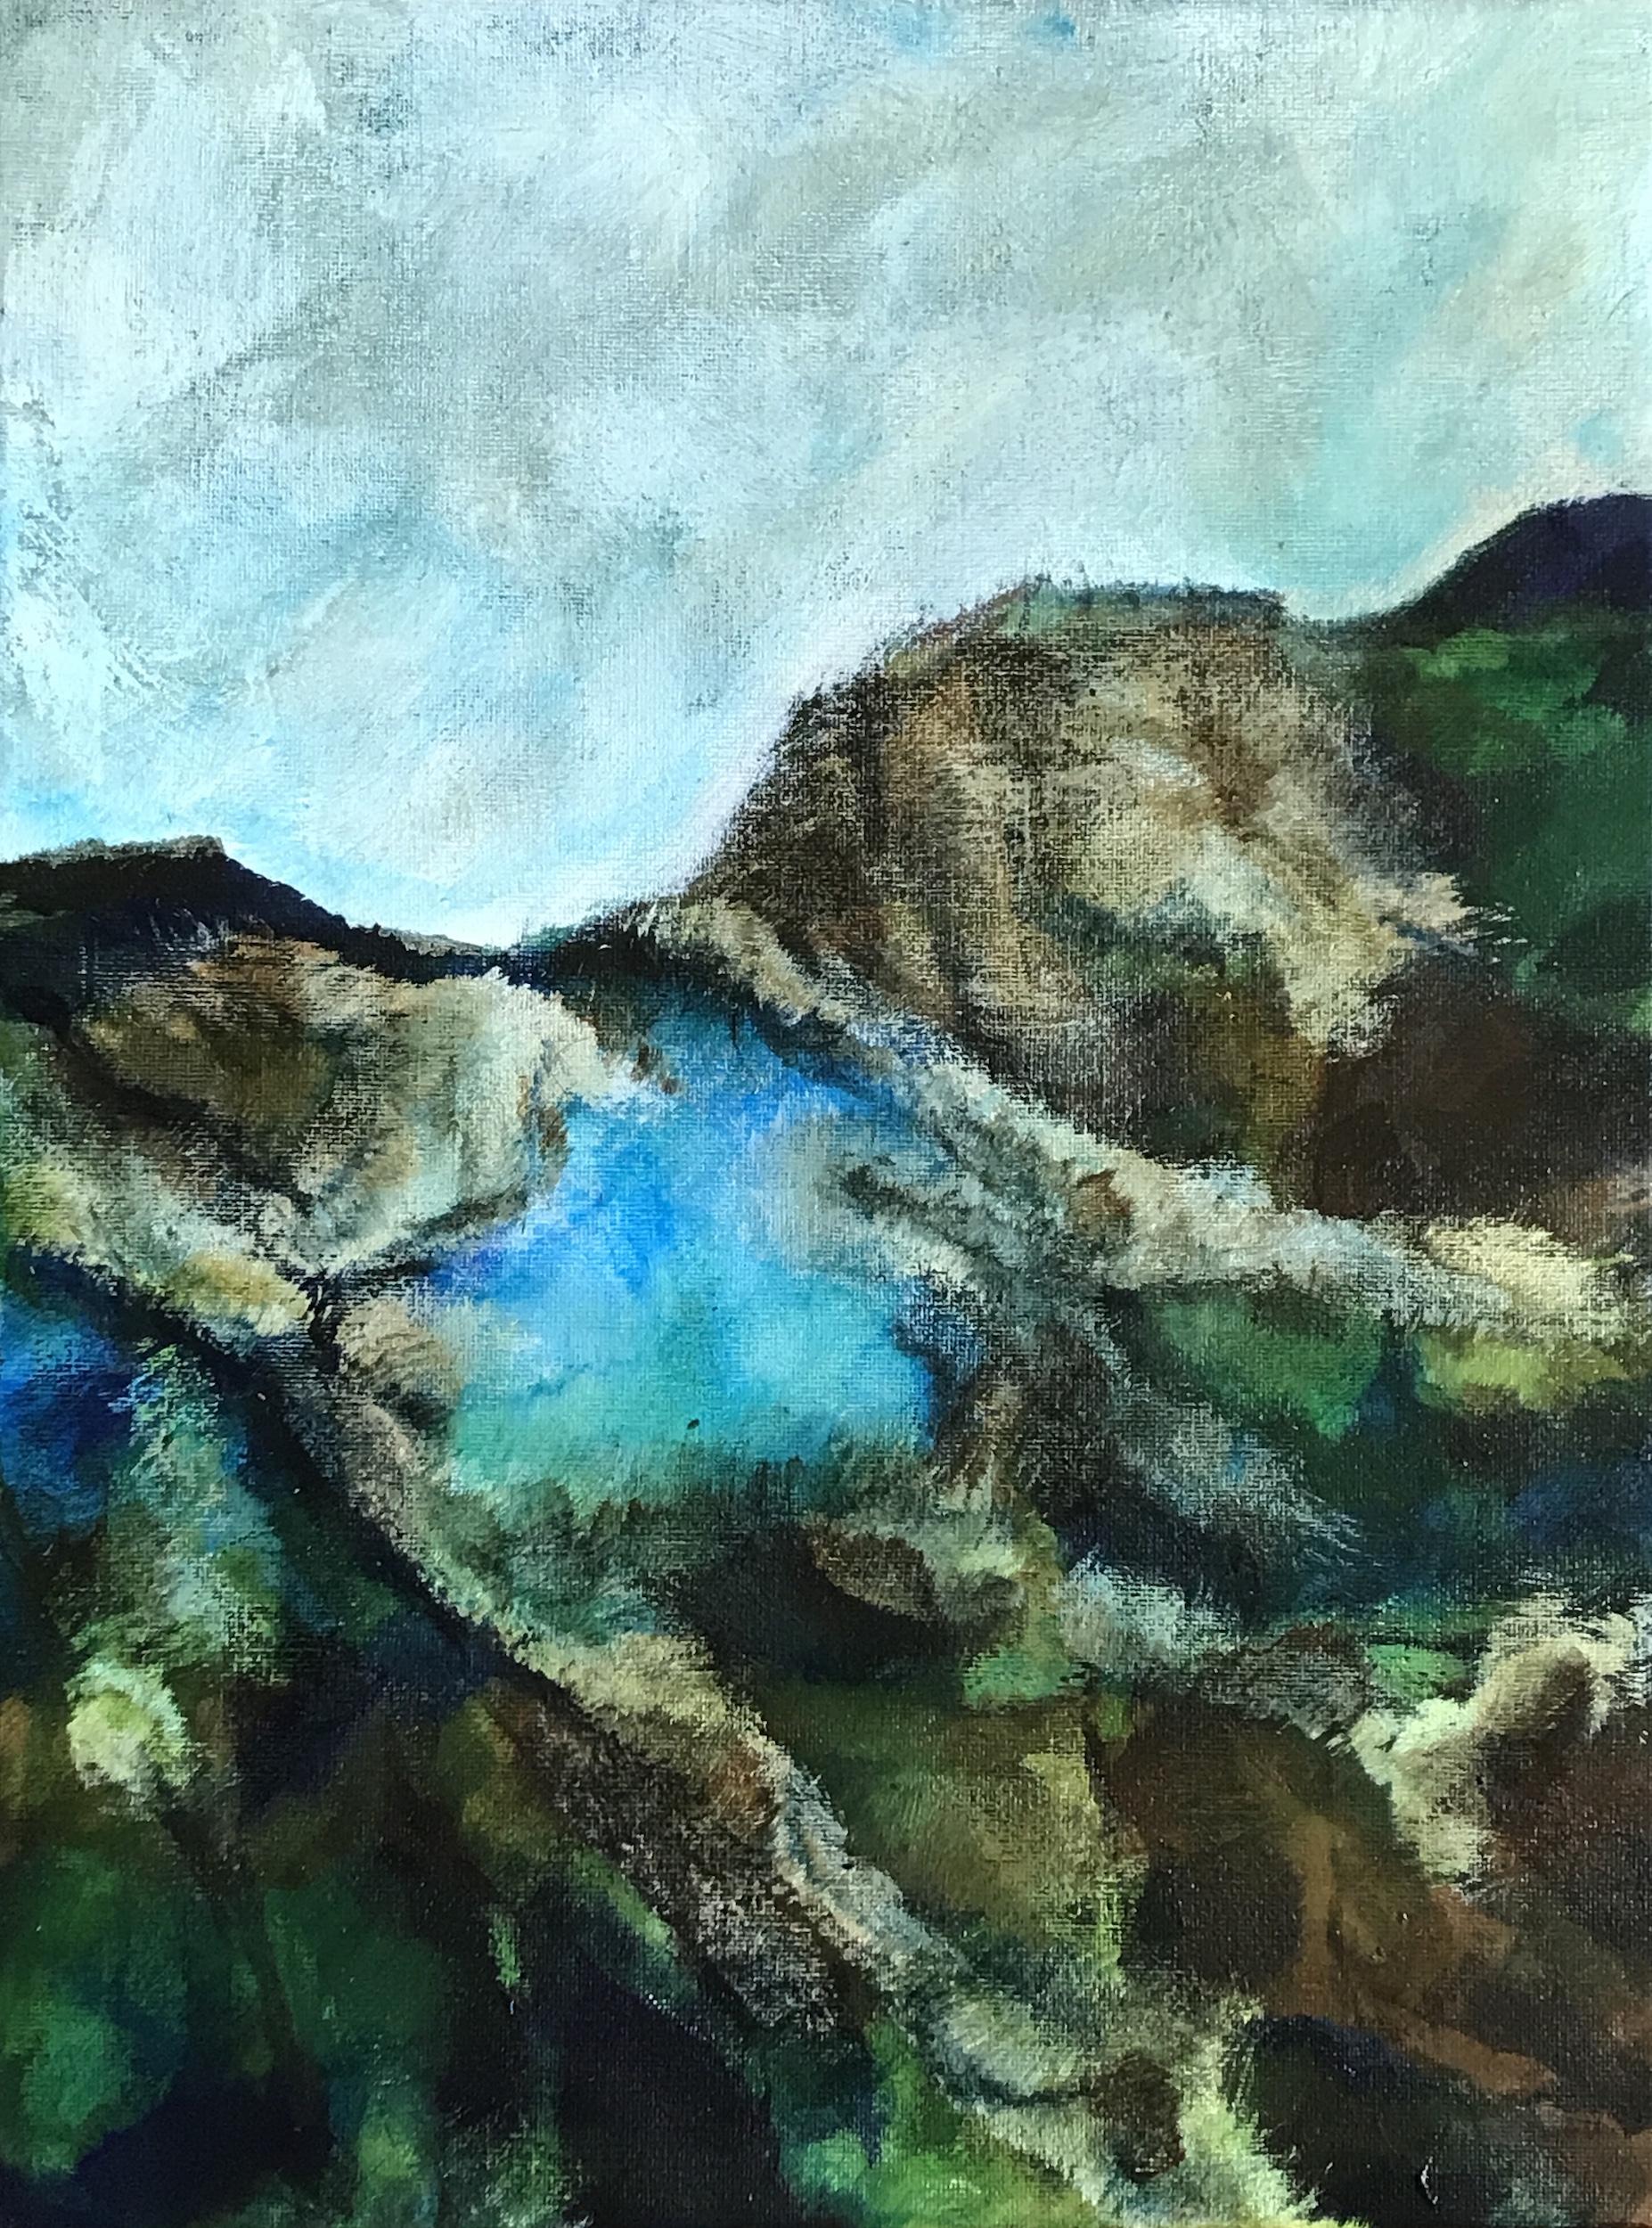 Malham - acrylic on canvas 30x40cm  £110